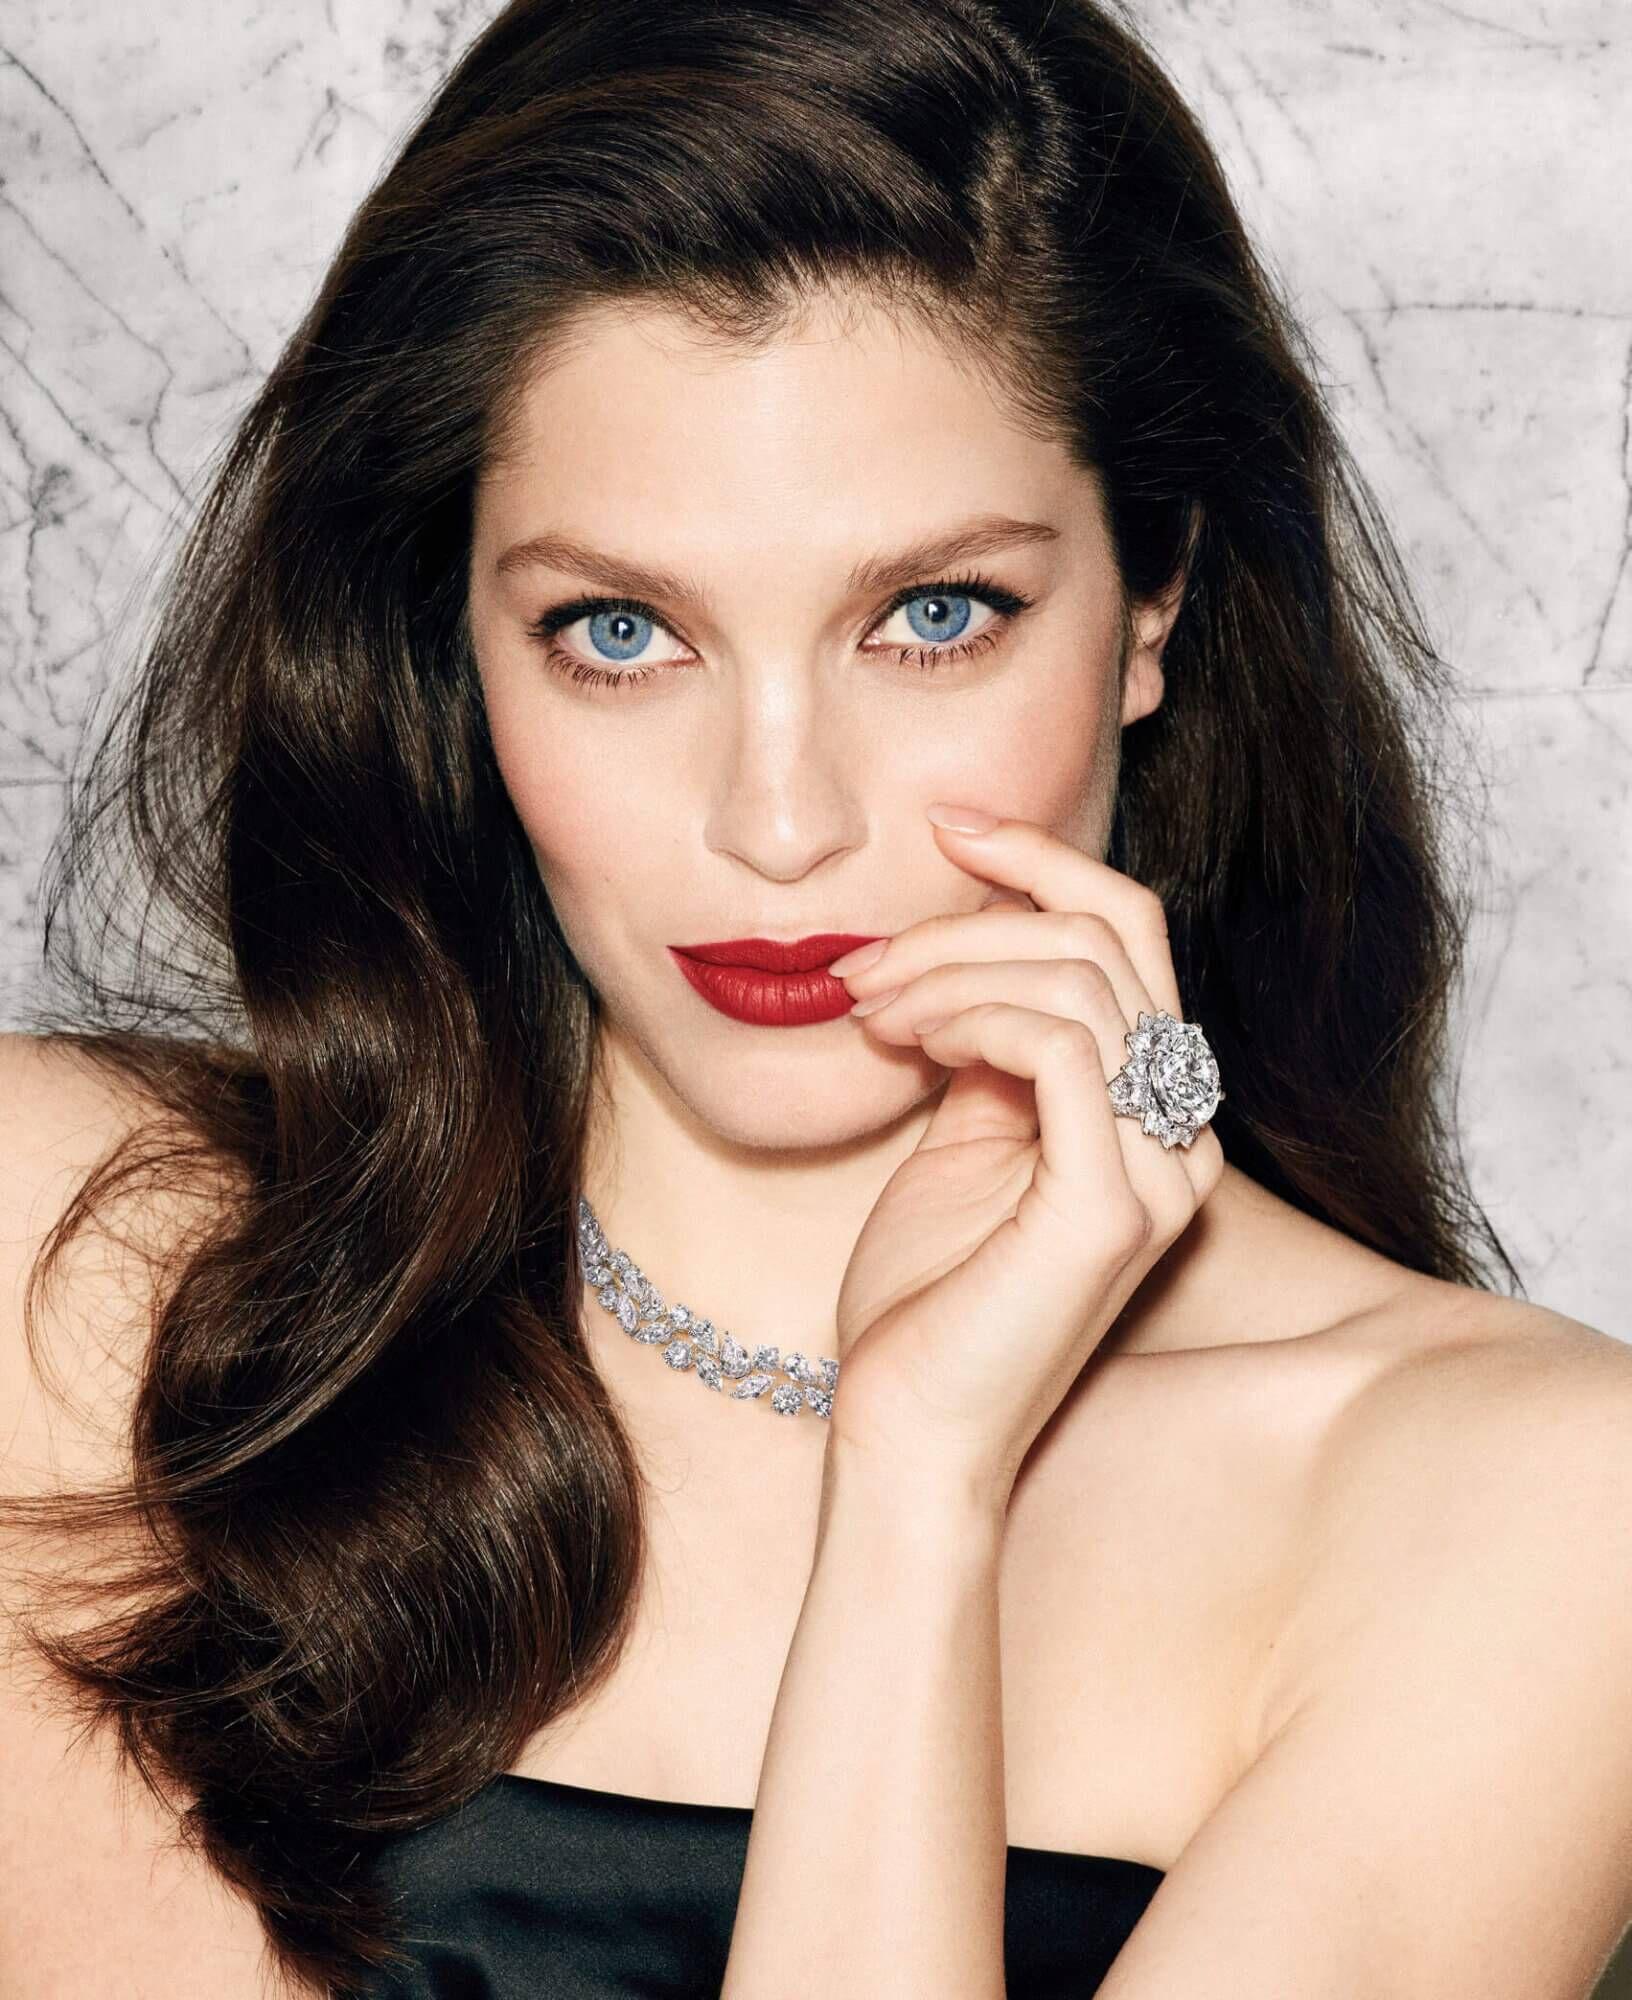 Model wears Graff Diamonds Lights Camera Action Article 30.88 carat D Flawless round diamond ring and Multishape diamond necklace